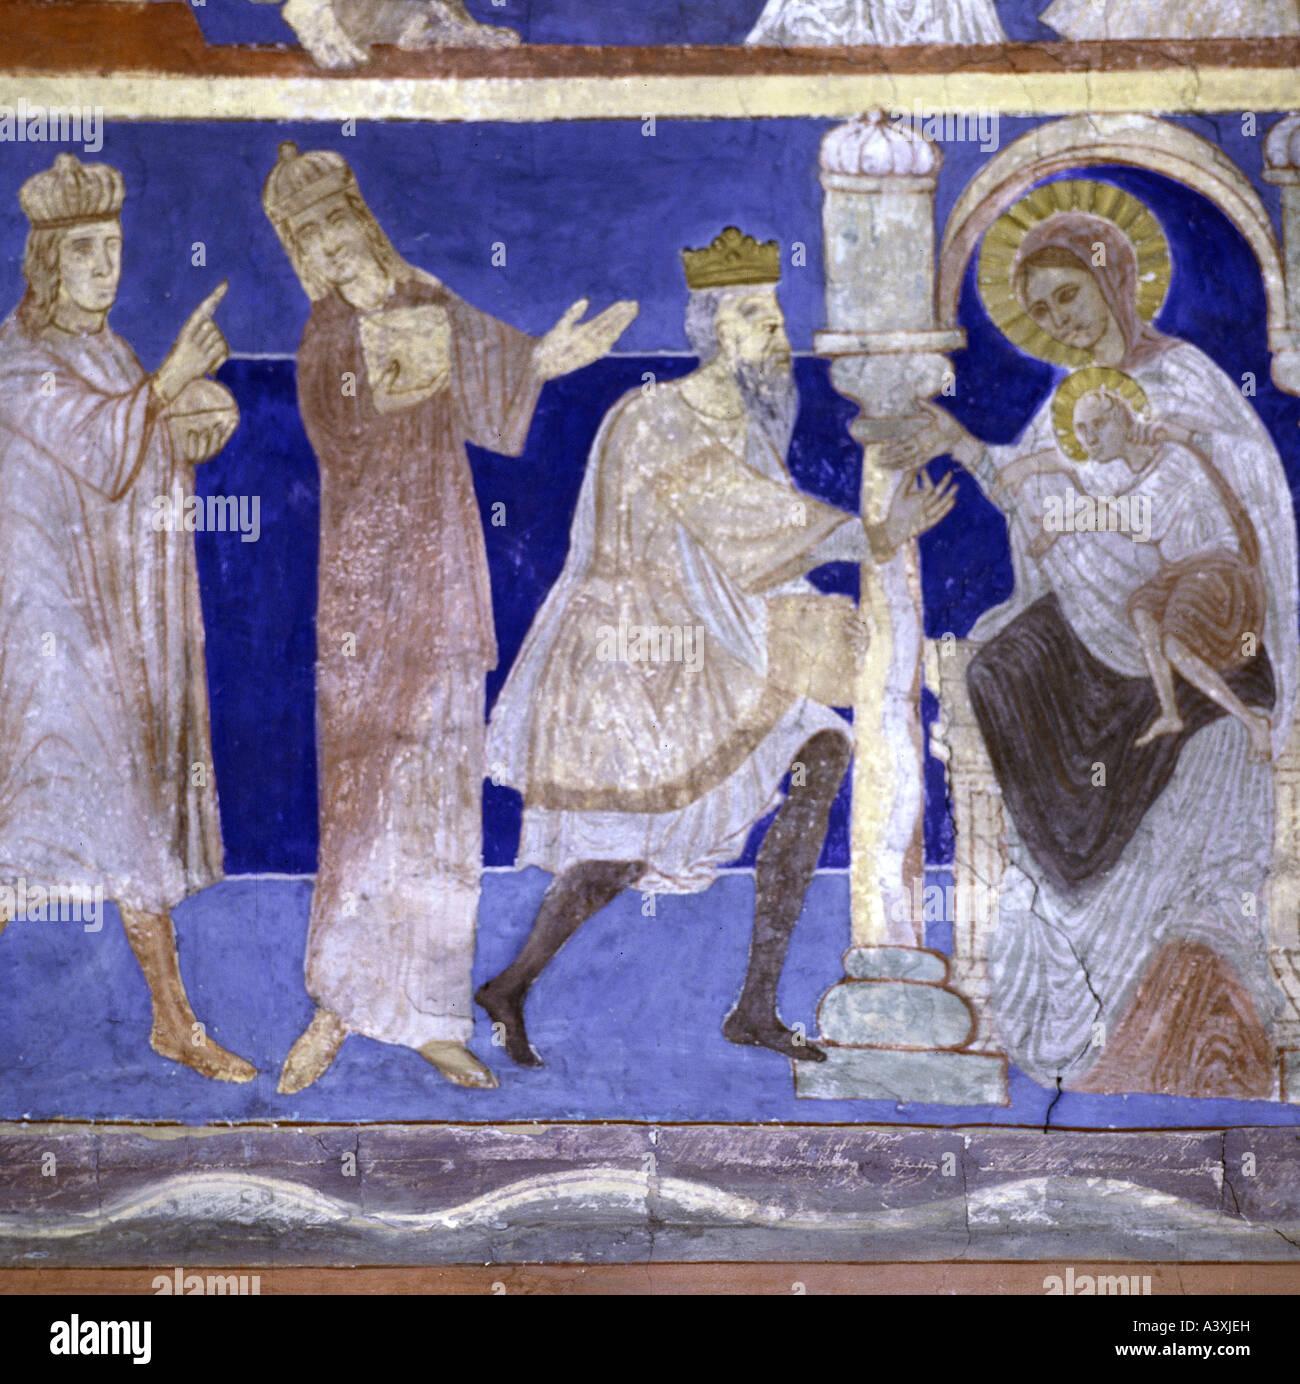 Religious Art: Fine Arts, Religious Art, Jesus Christ, Birth, Adoration